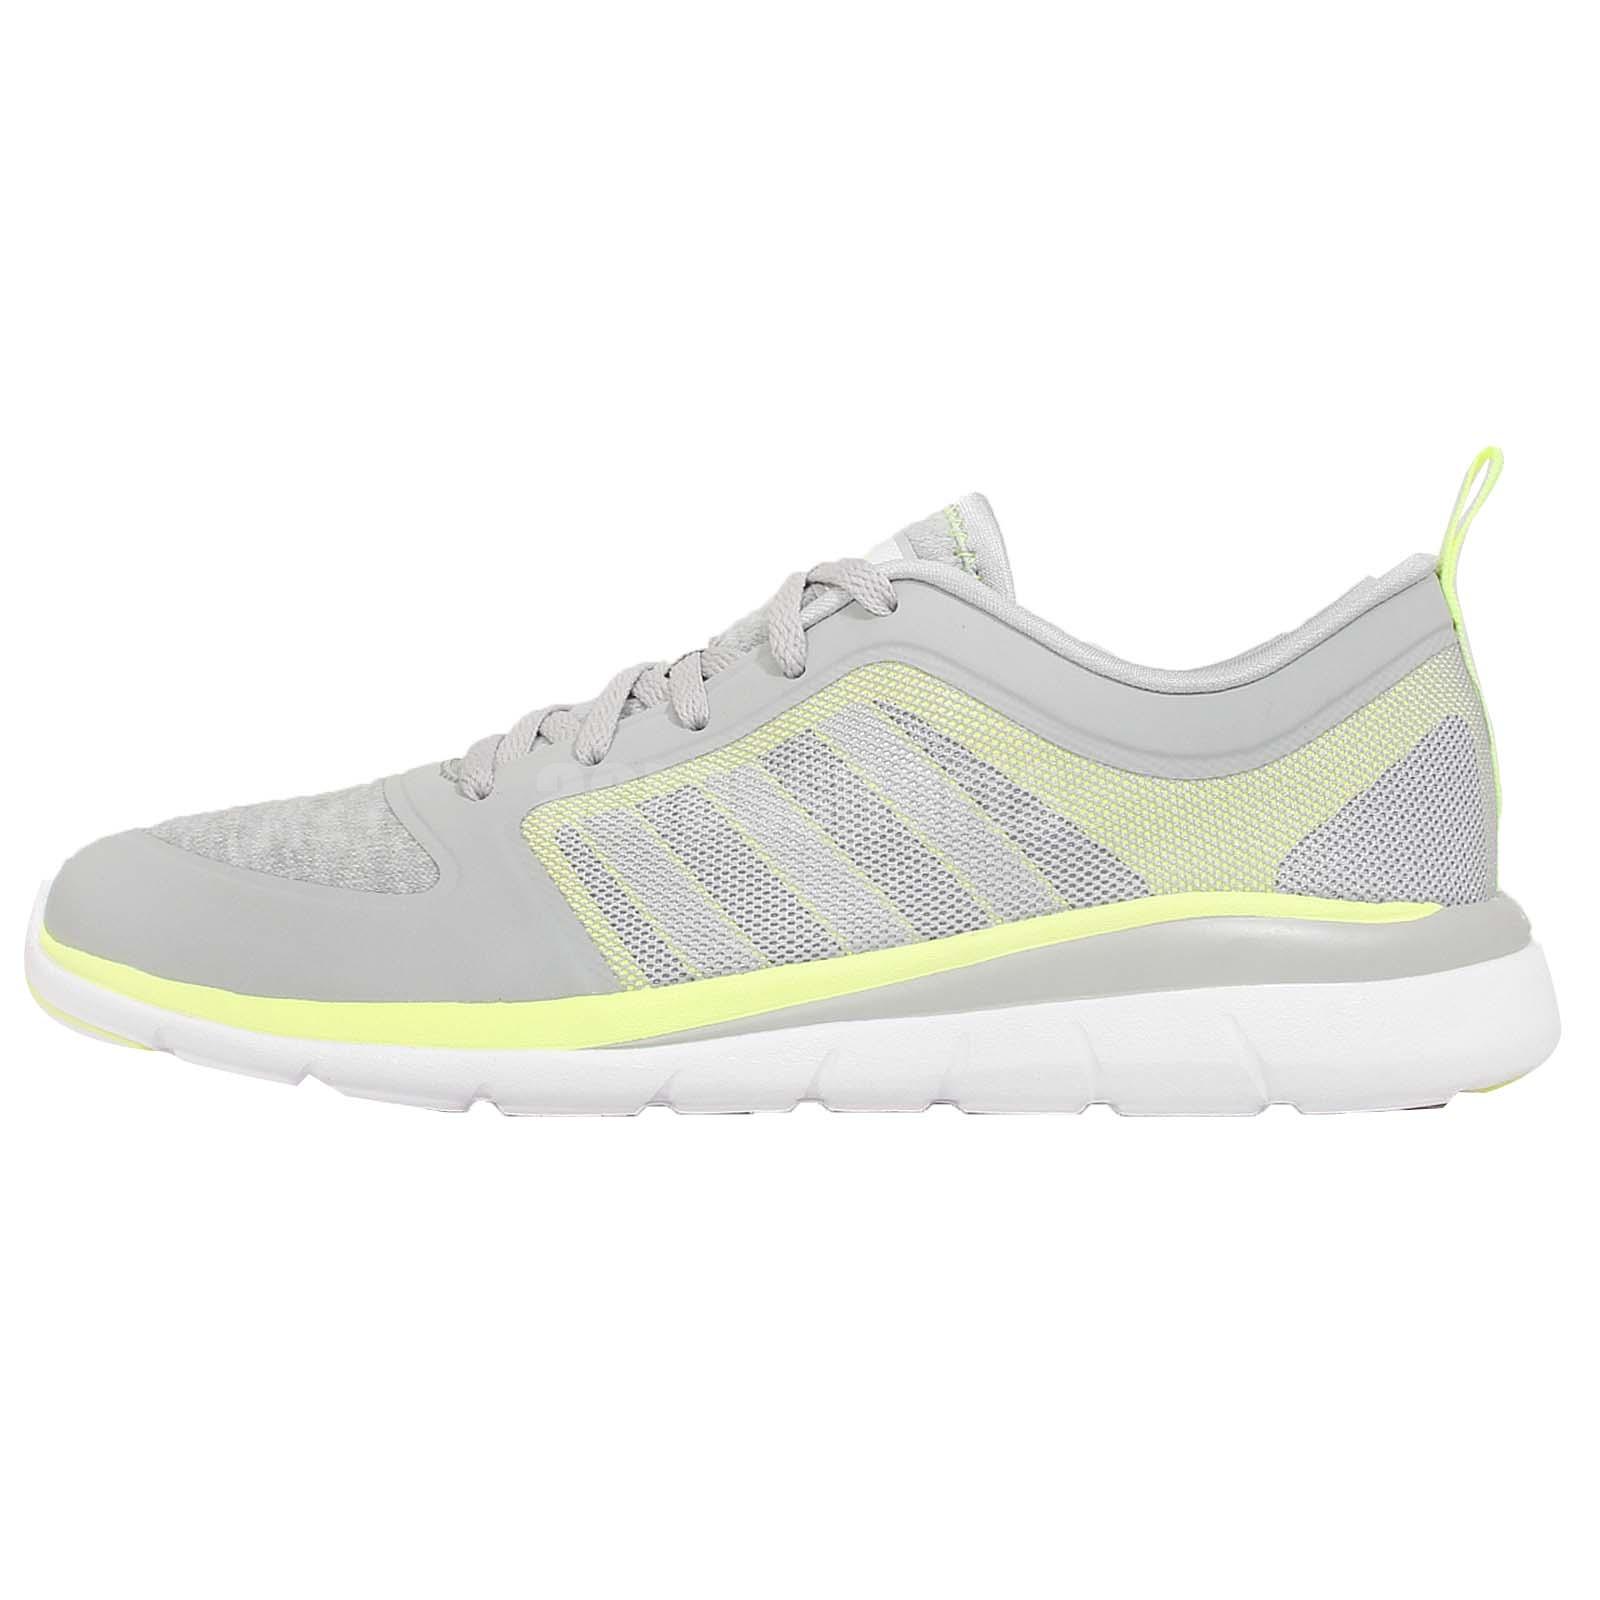 Adidas Neo X